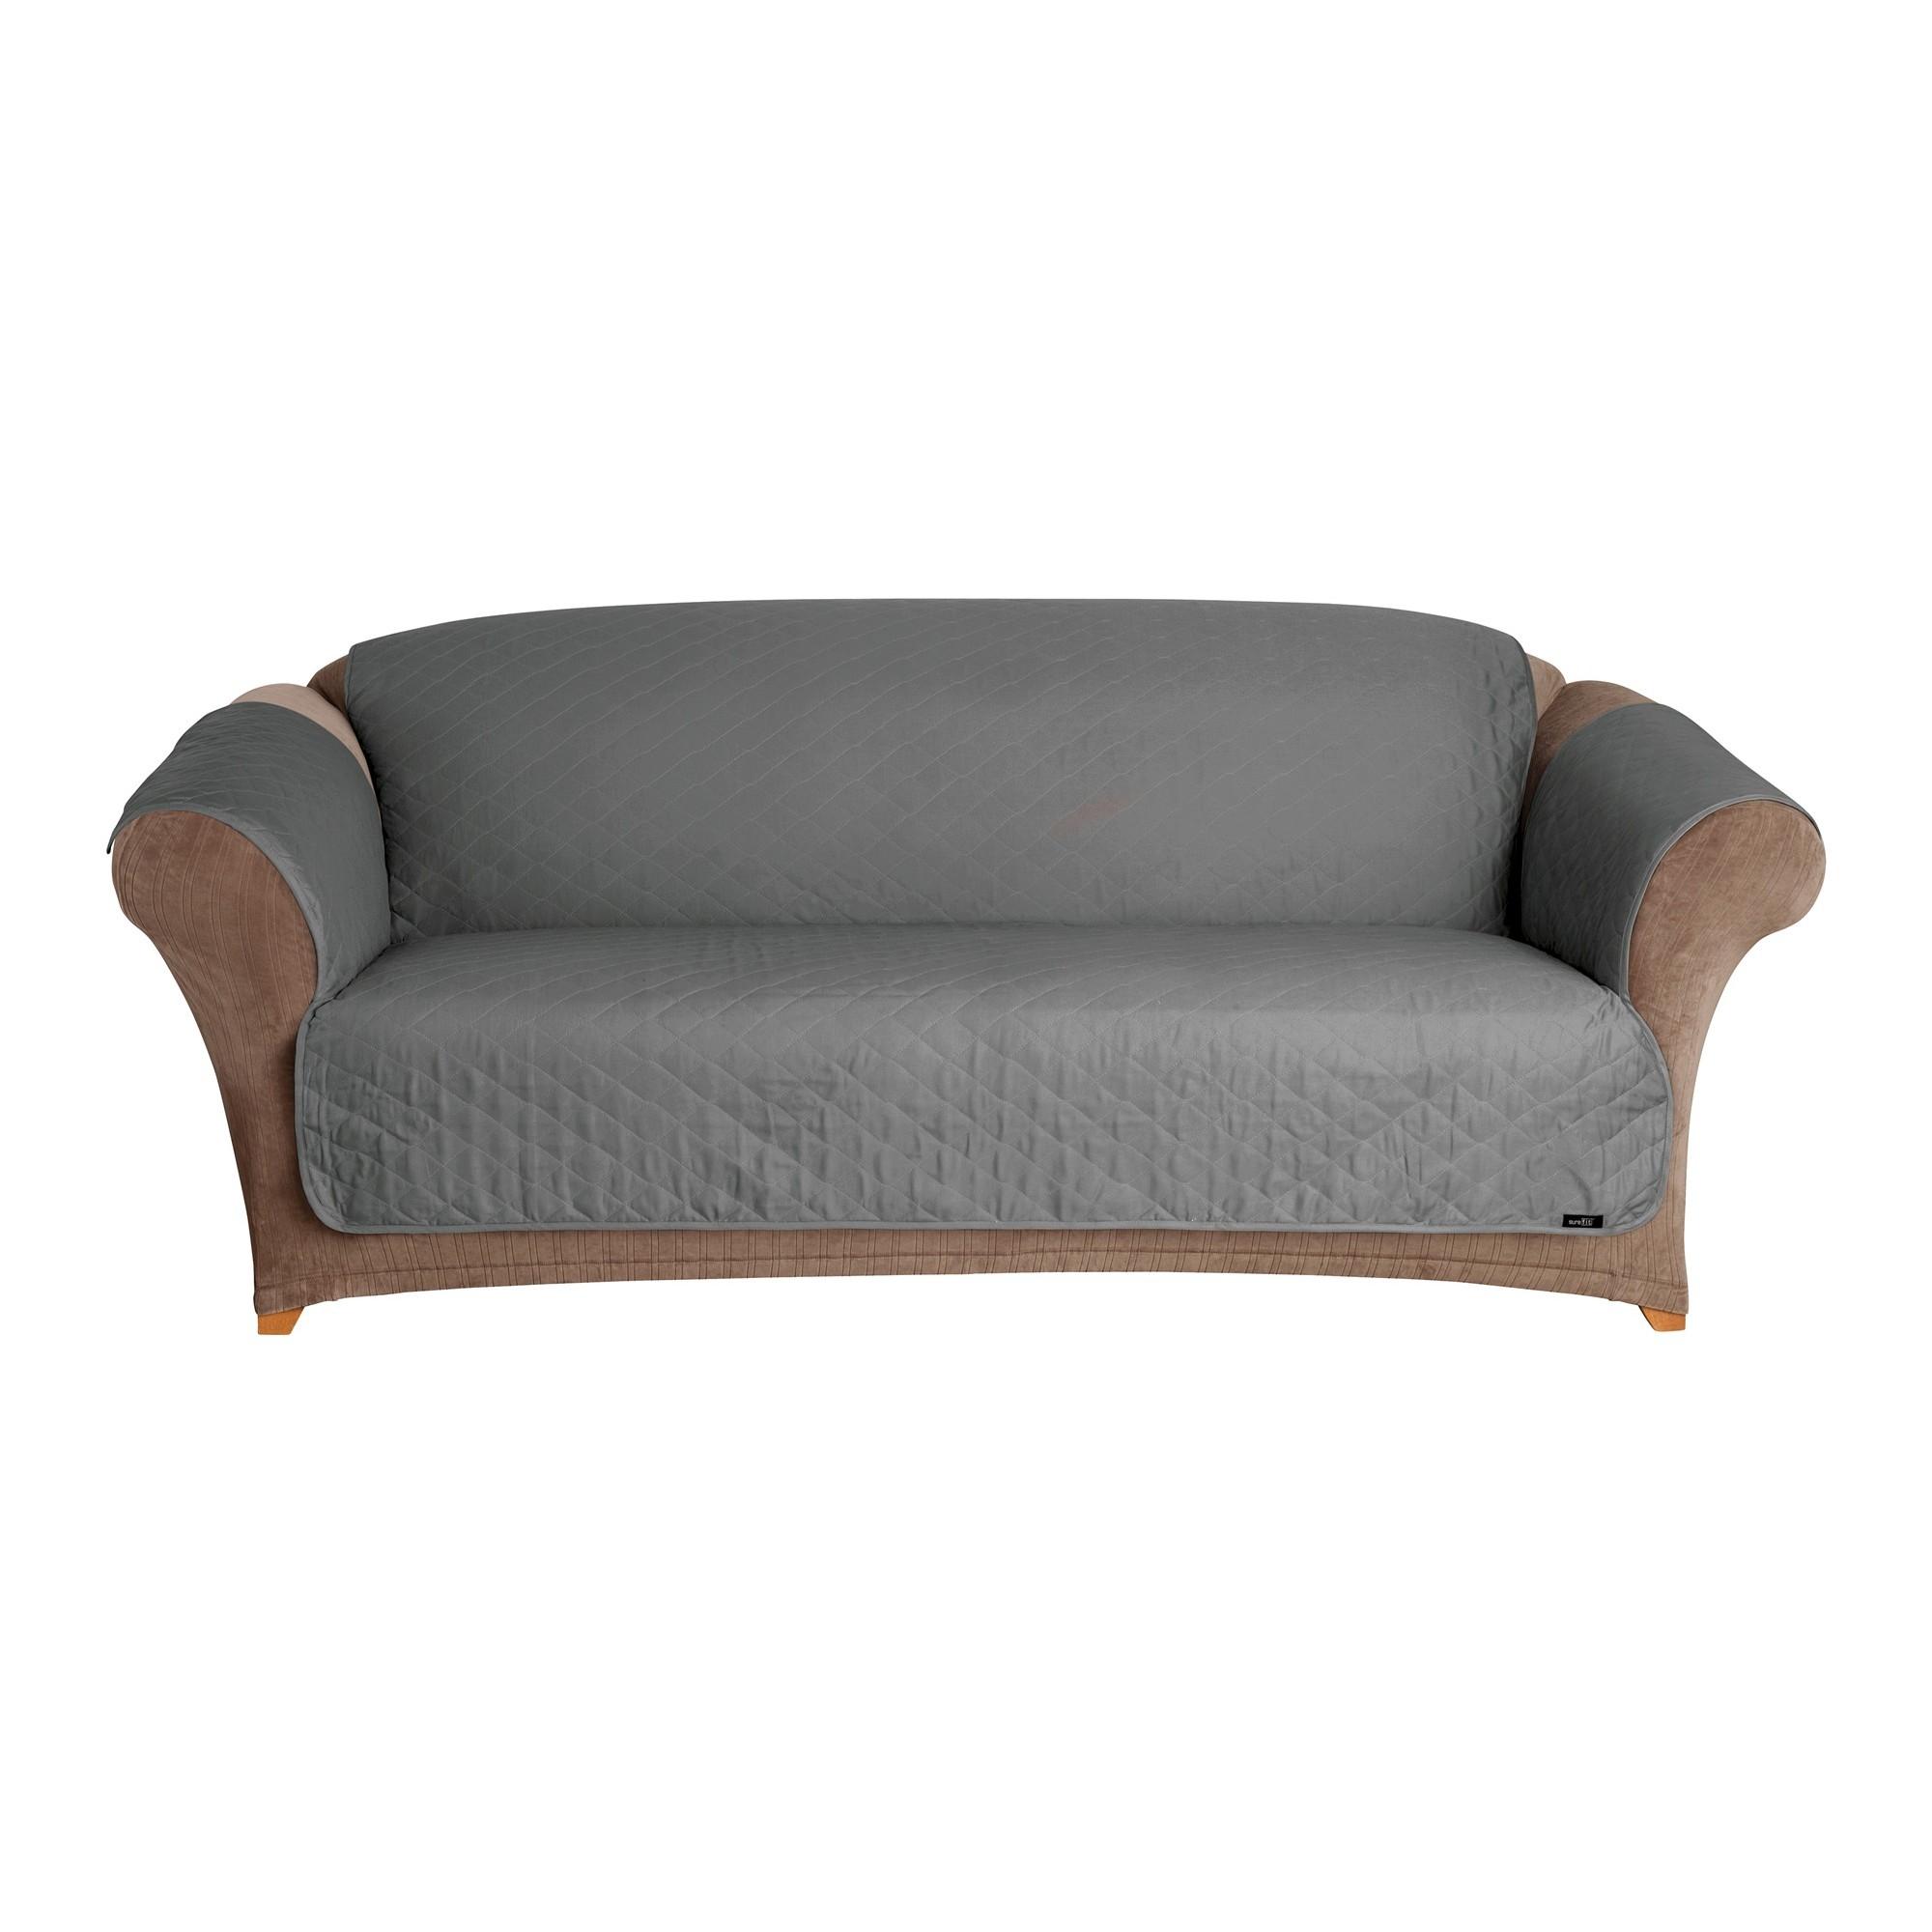 Gray Pet Friendly Sofa Slipcover Sure Fit Products Pet Sofa